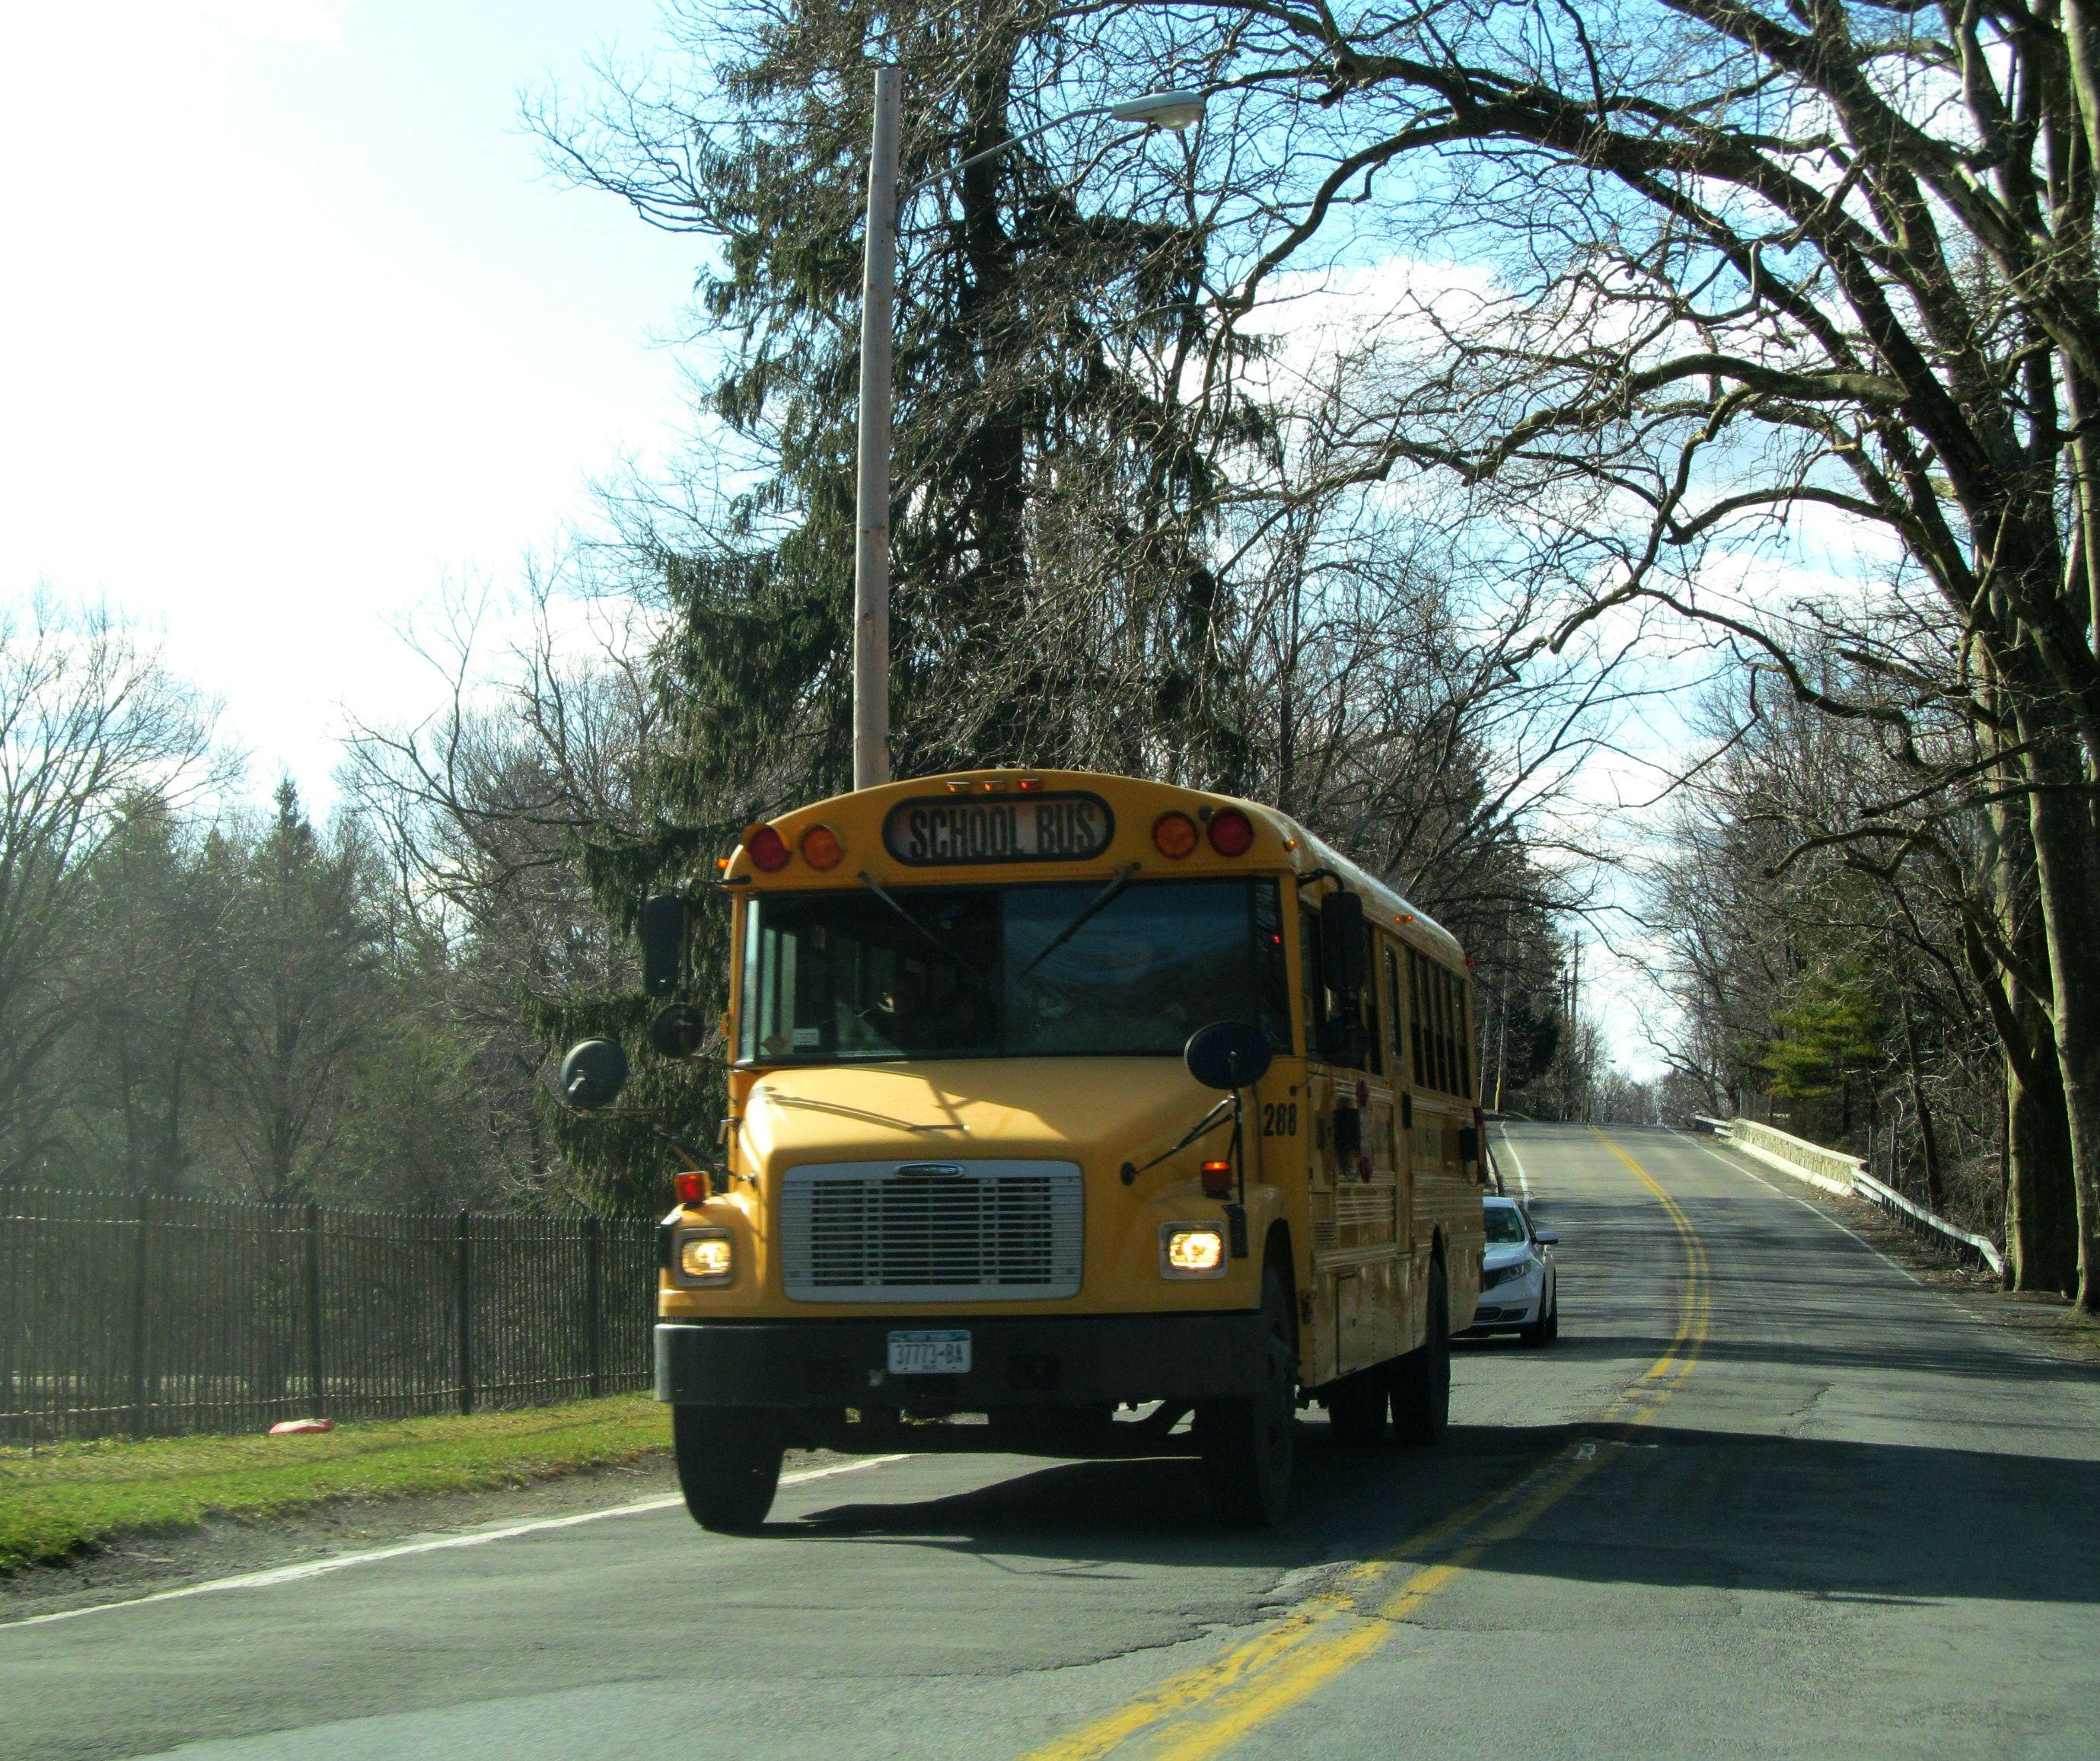 288 looking good school bus bus newburgh ny